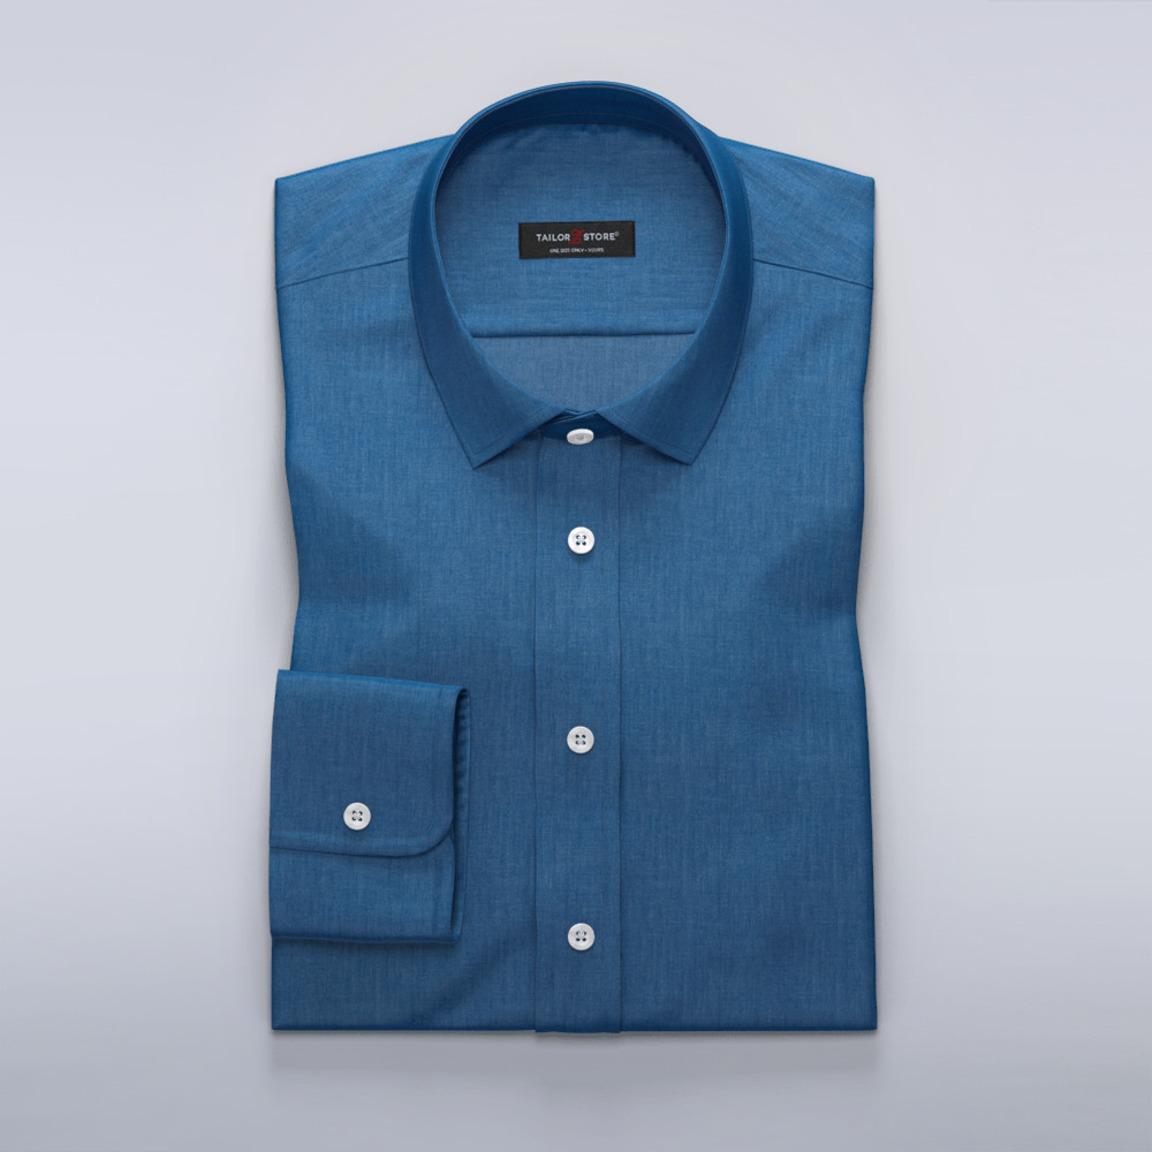 Denimblaues Hemd aus Baumwoll-Tencel-Twillstoff